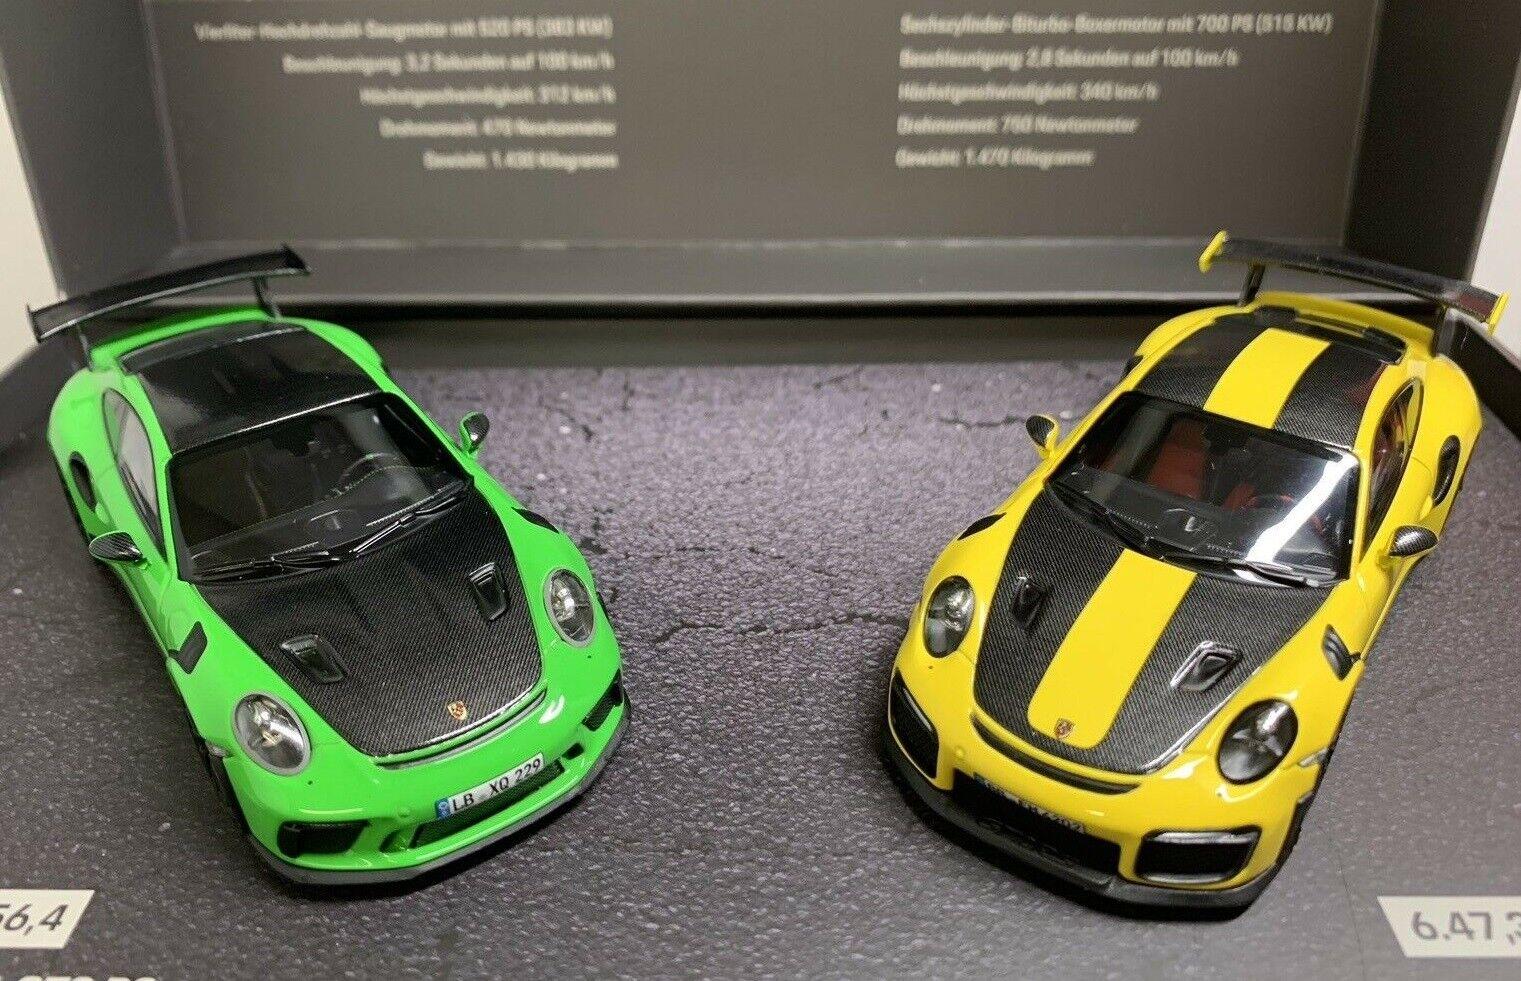 Porsche 911 GT3 RS Lagarto verde GT2 RS Racing giallo conjunto viene Minichamps